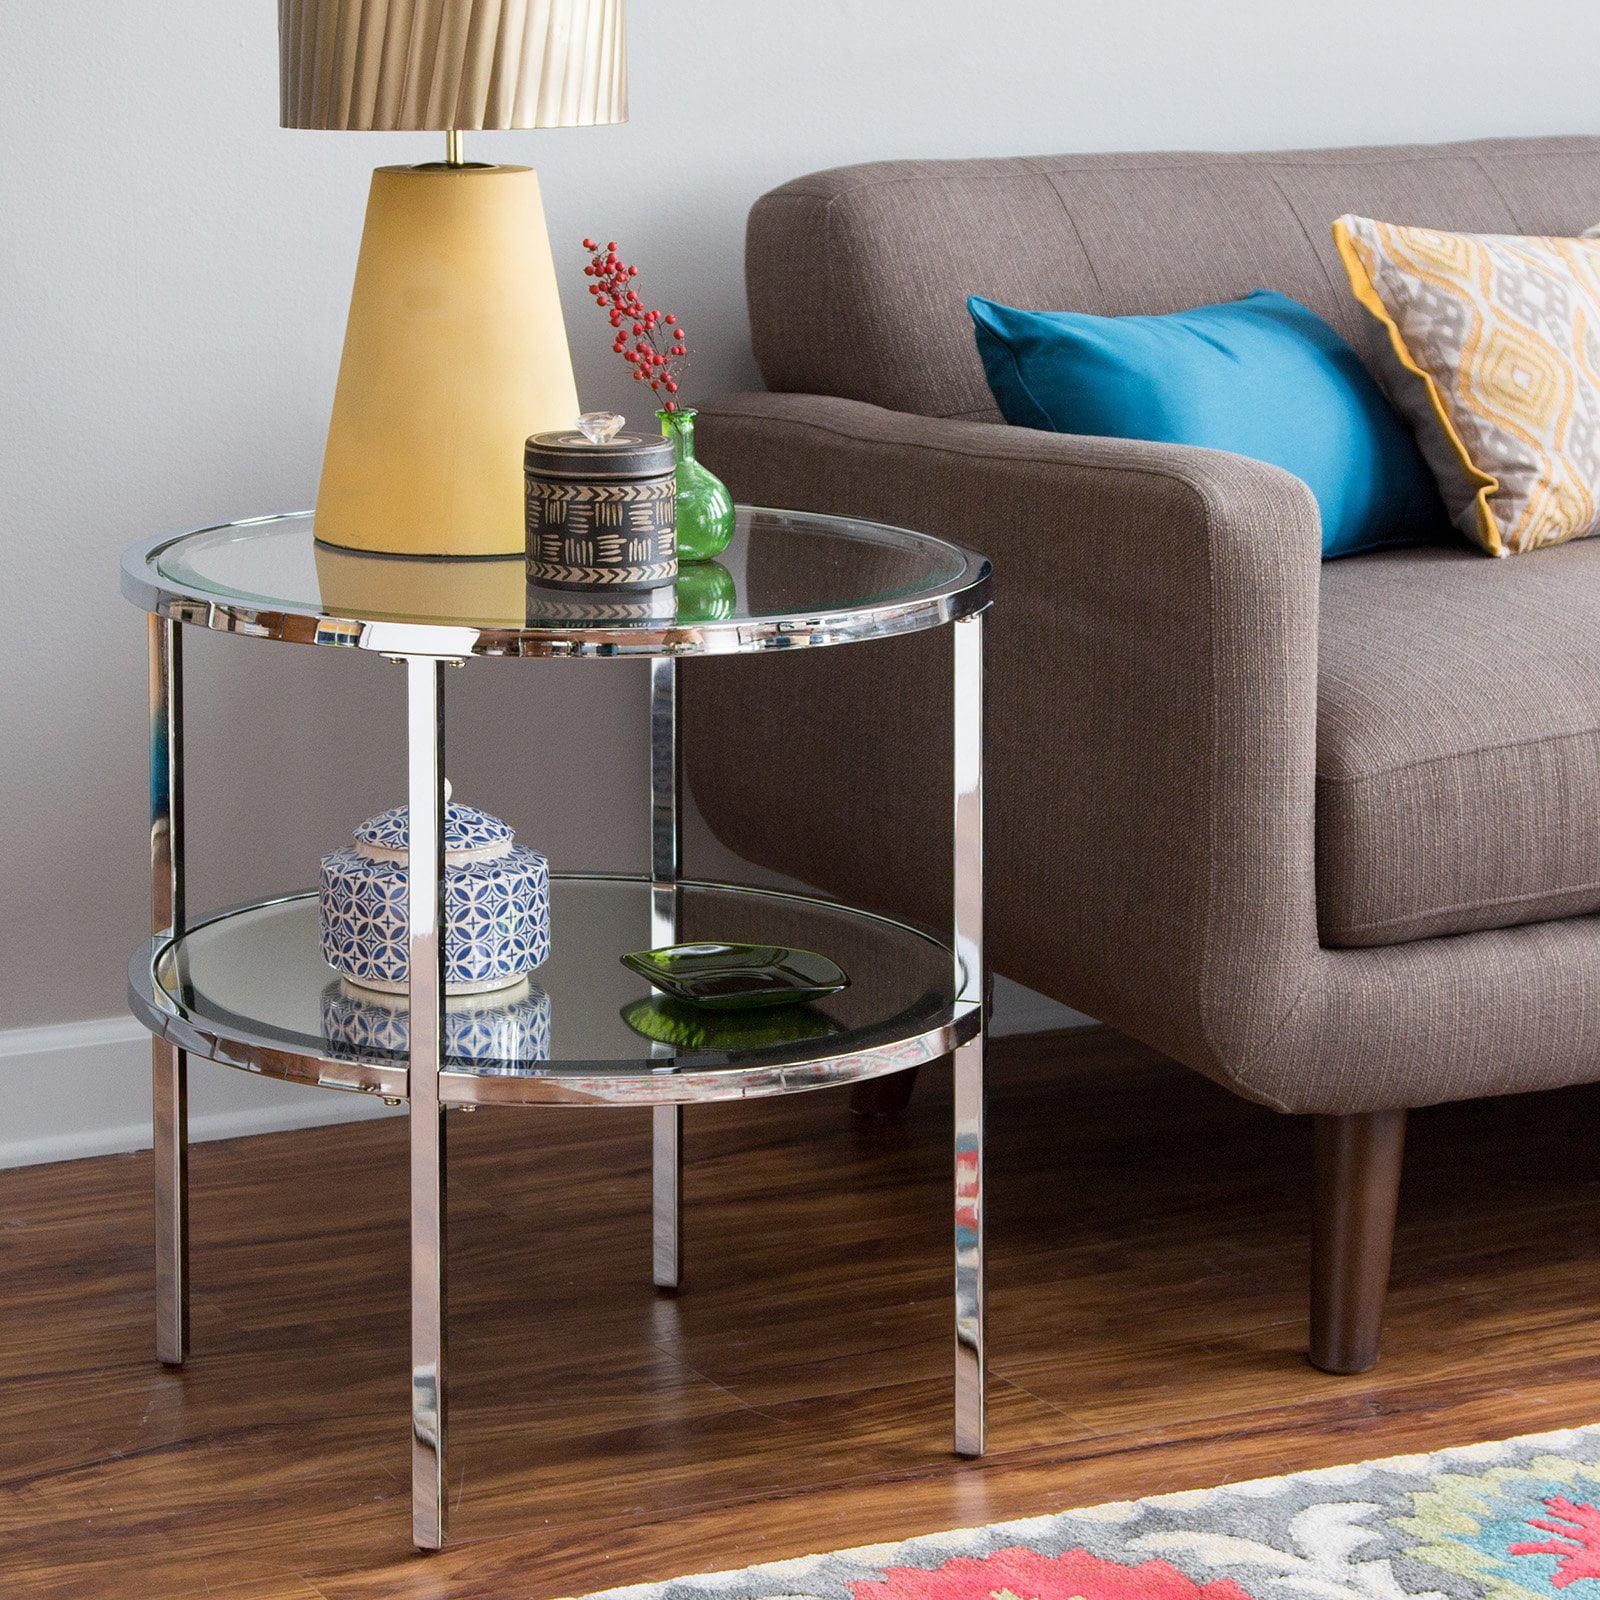 Belham Living Lamont Round End Table - Chrome